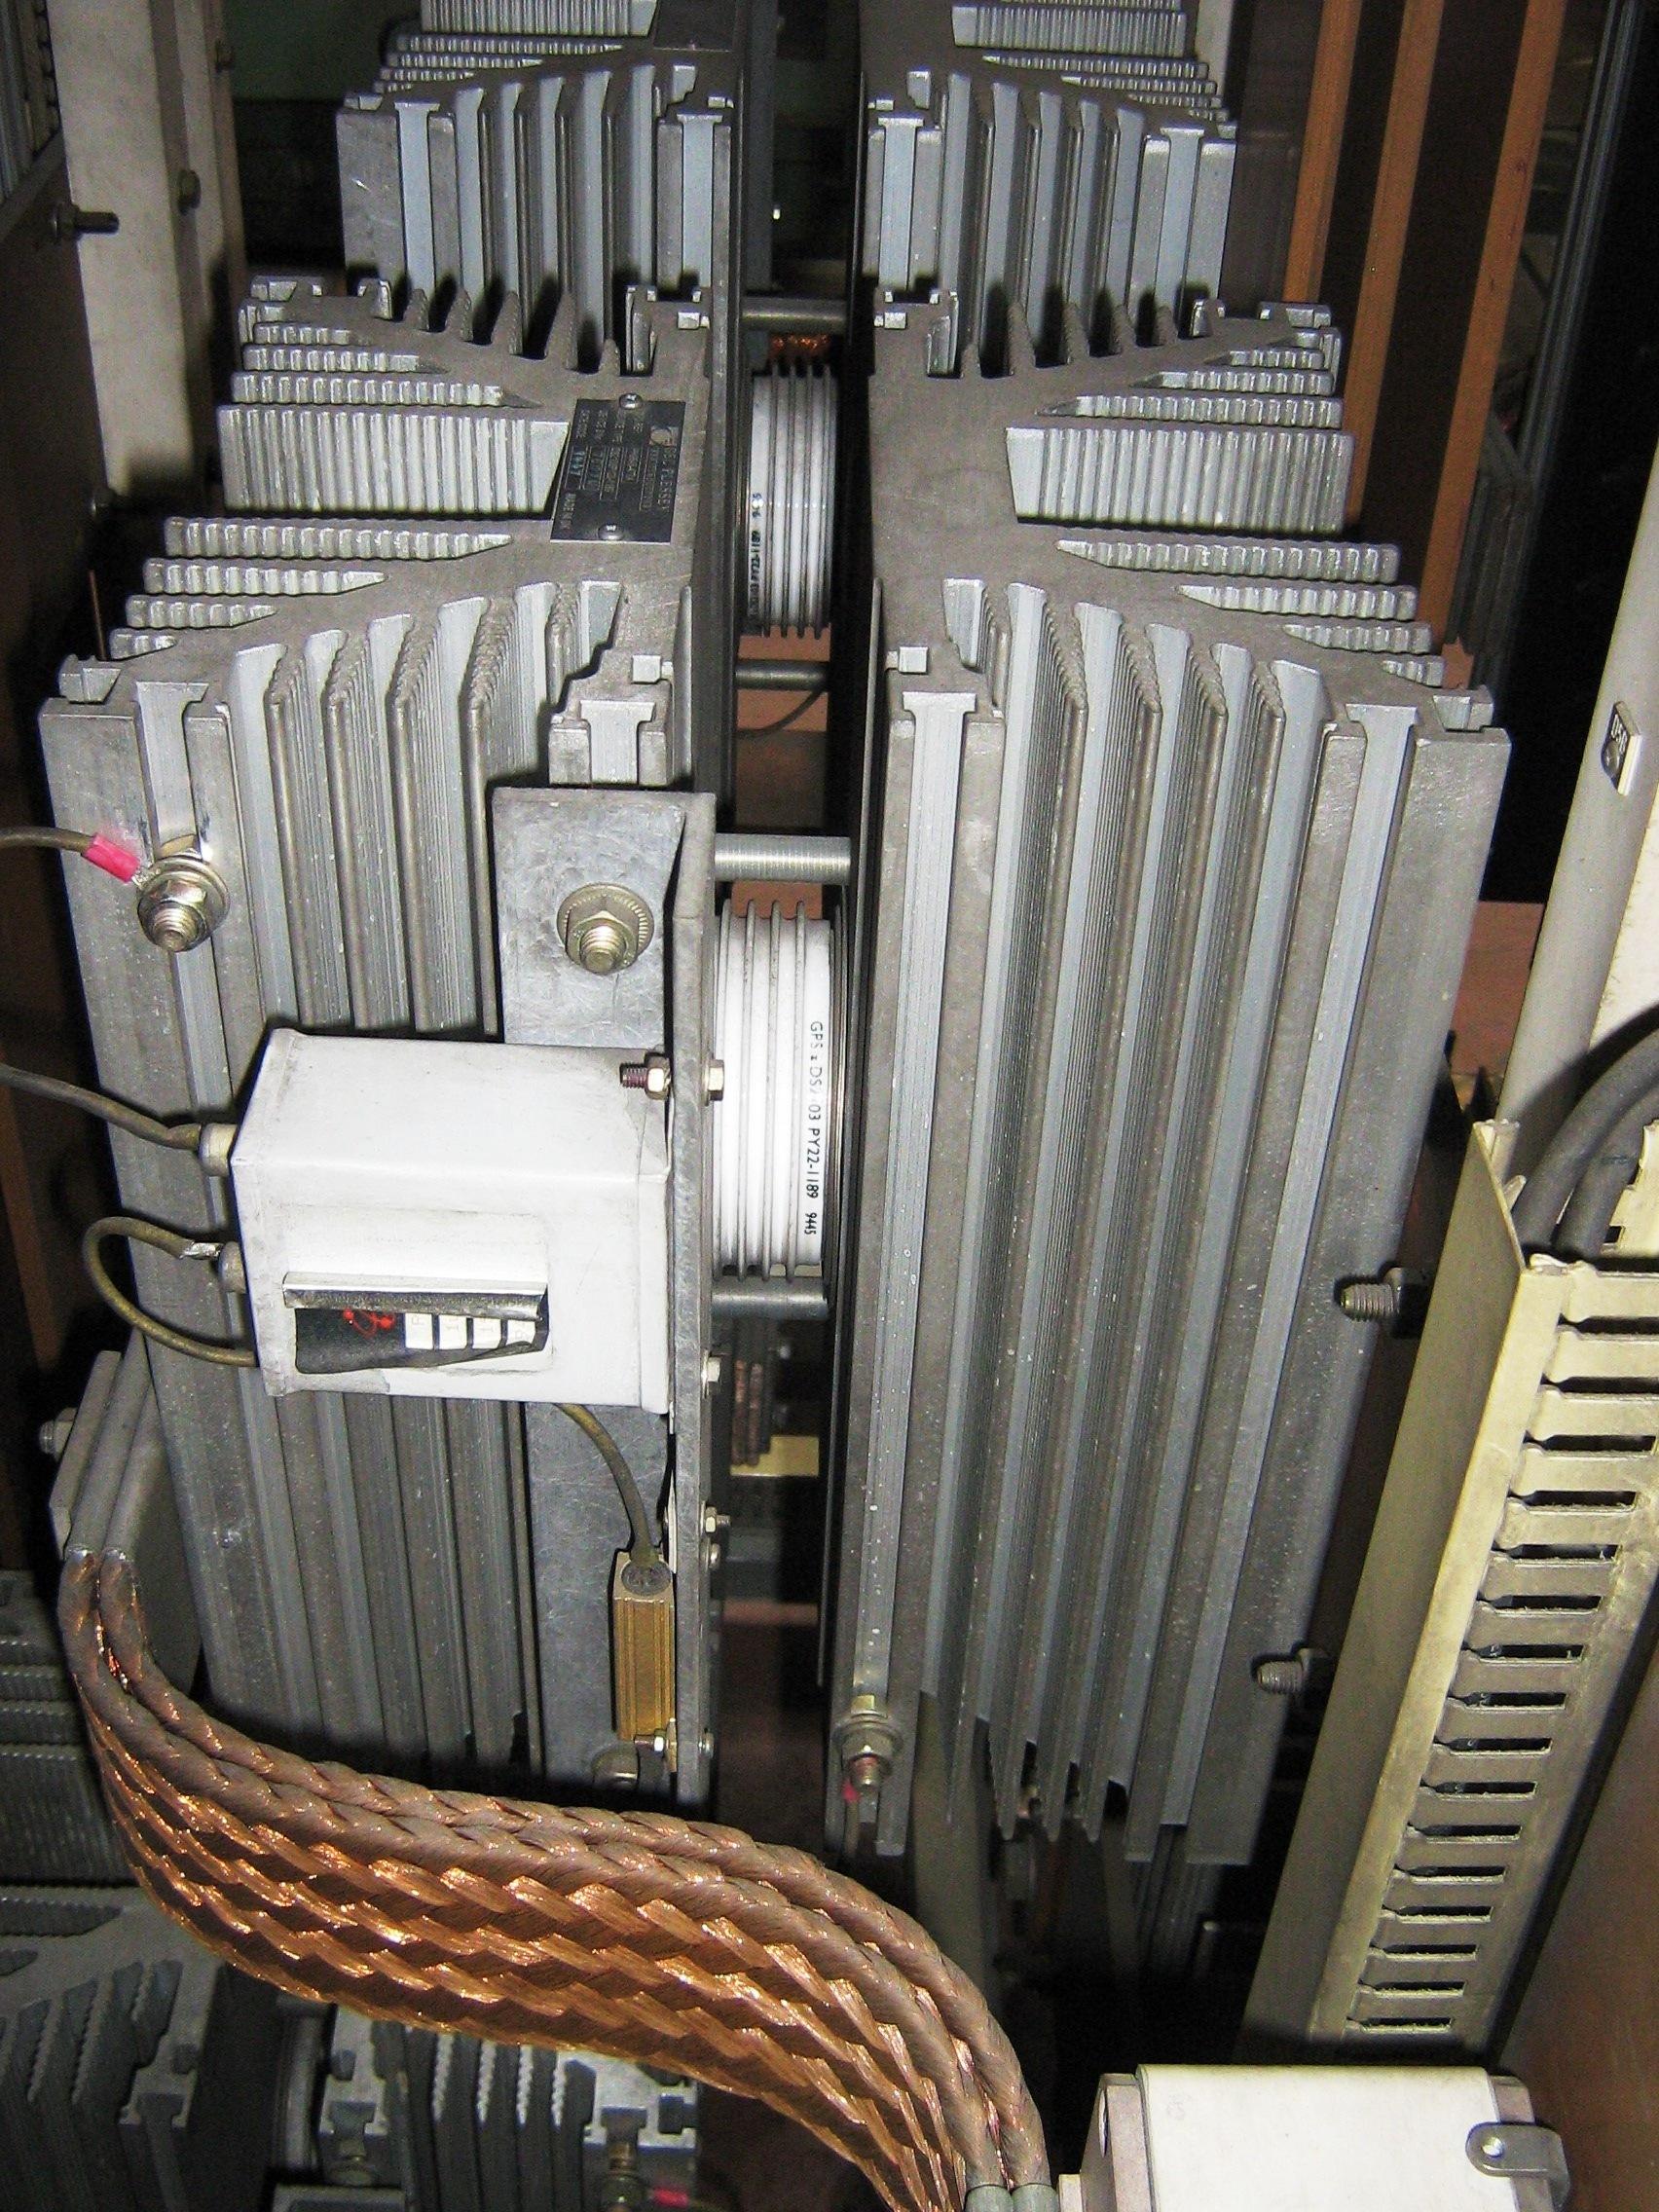 Diode Rectifier Circuits Radioelectronicscom